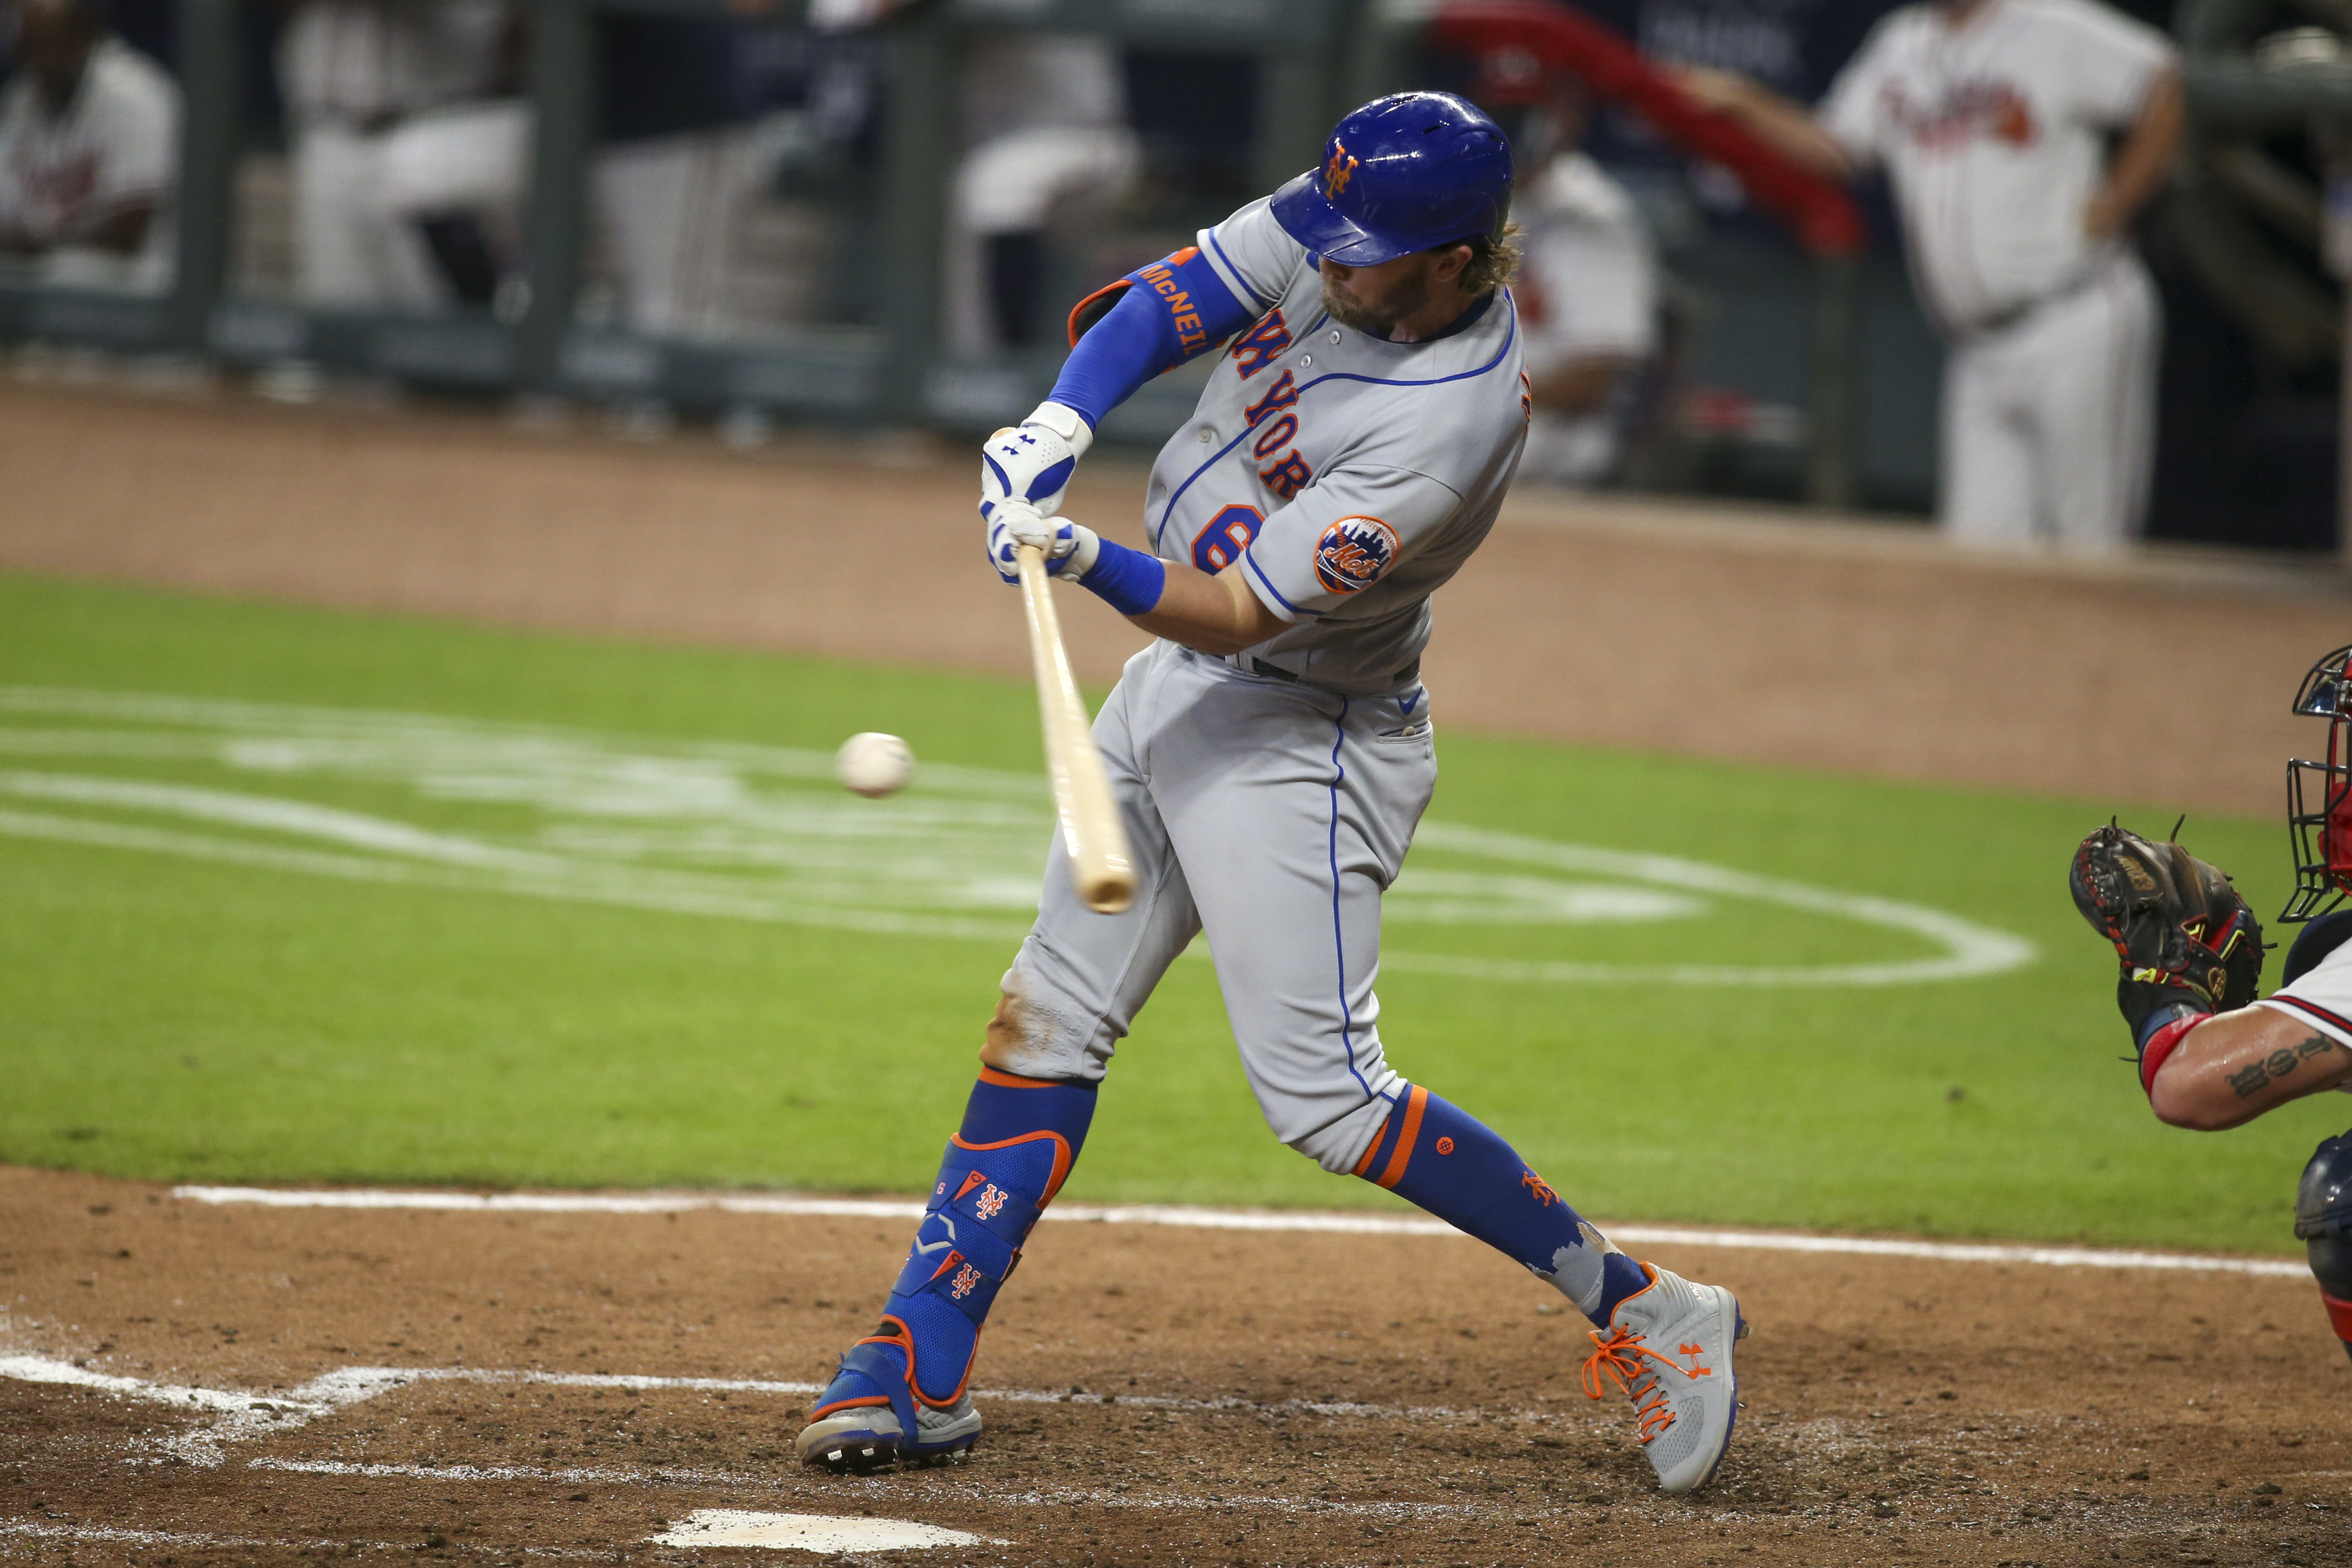 8/2/20 Game Preview: New York Mets at Atlanta Braves